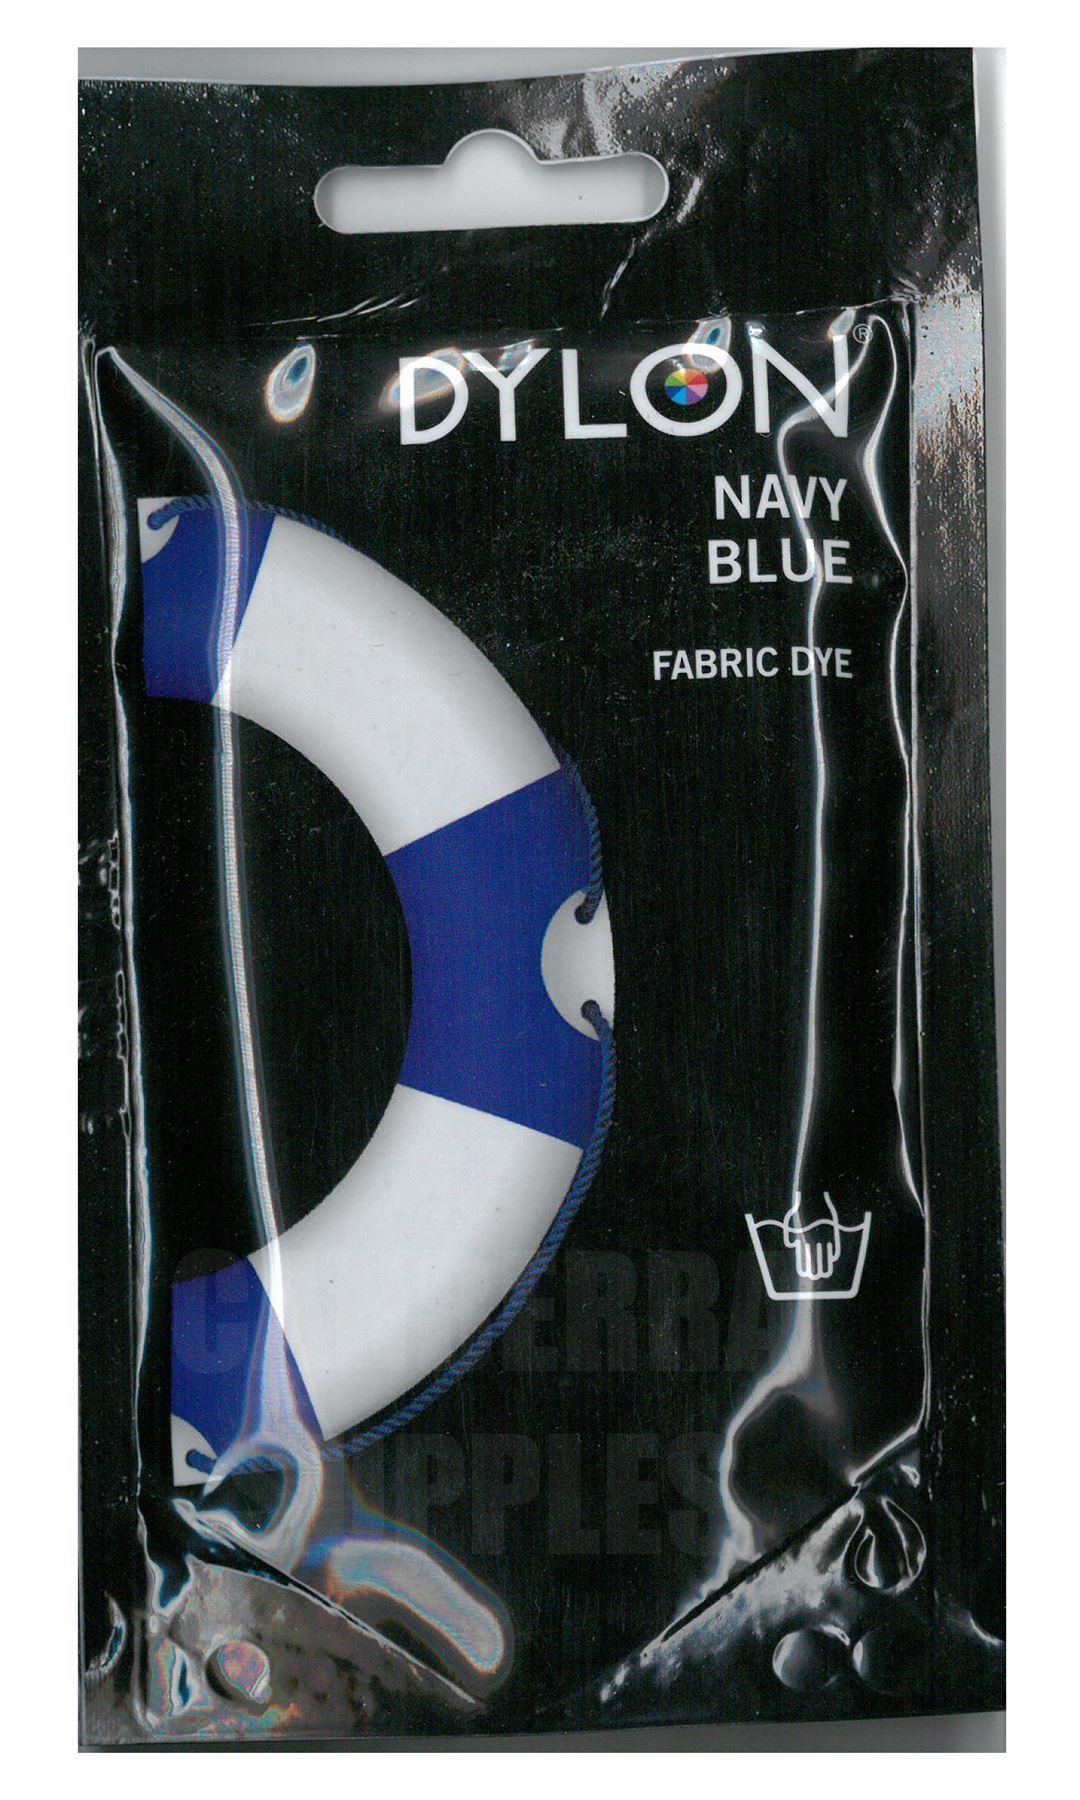 dylon fabric clothes dye navy blue hand wash use 50g. Black Bedroom Furniture Sets. Home Design Ideas